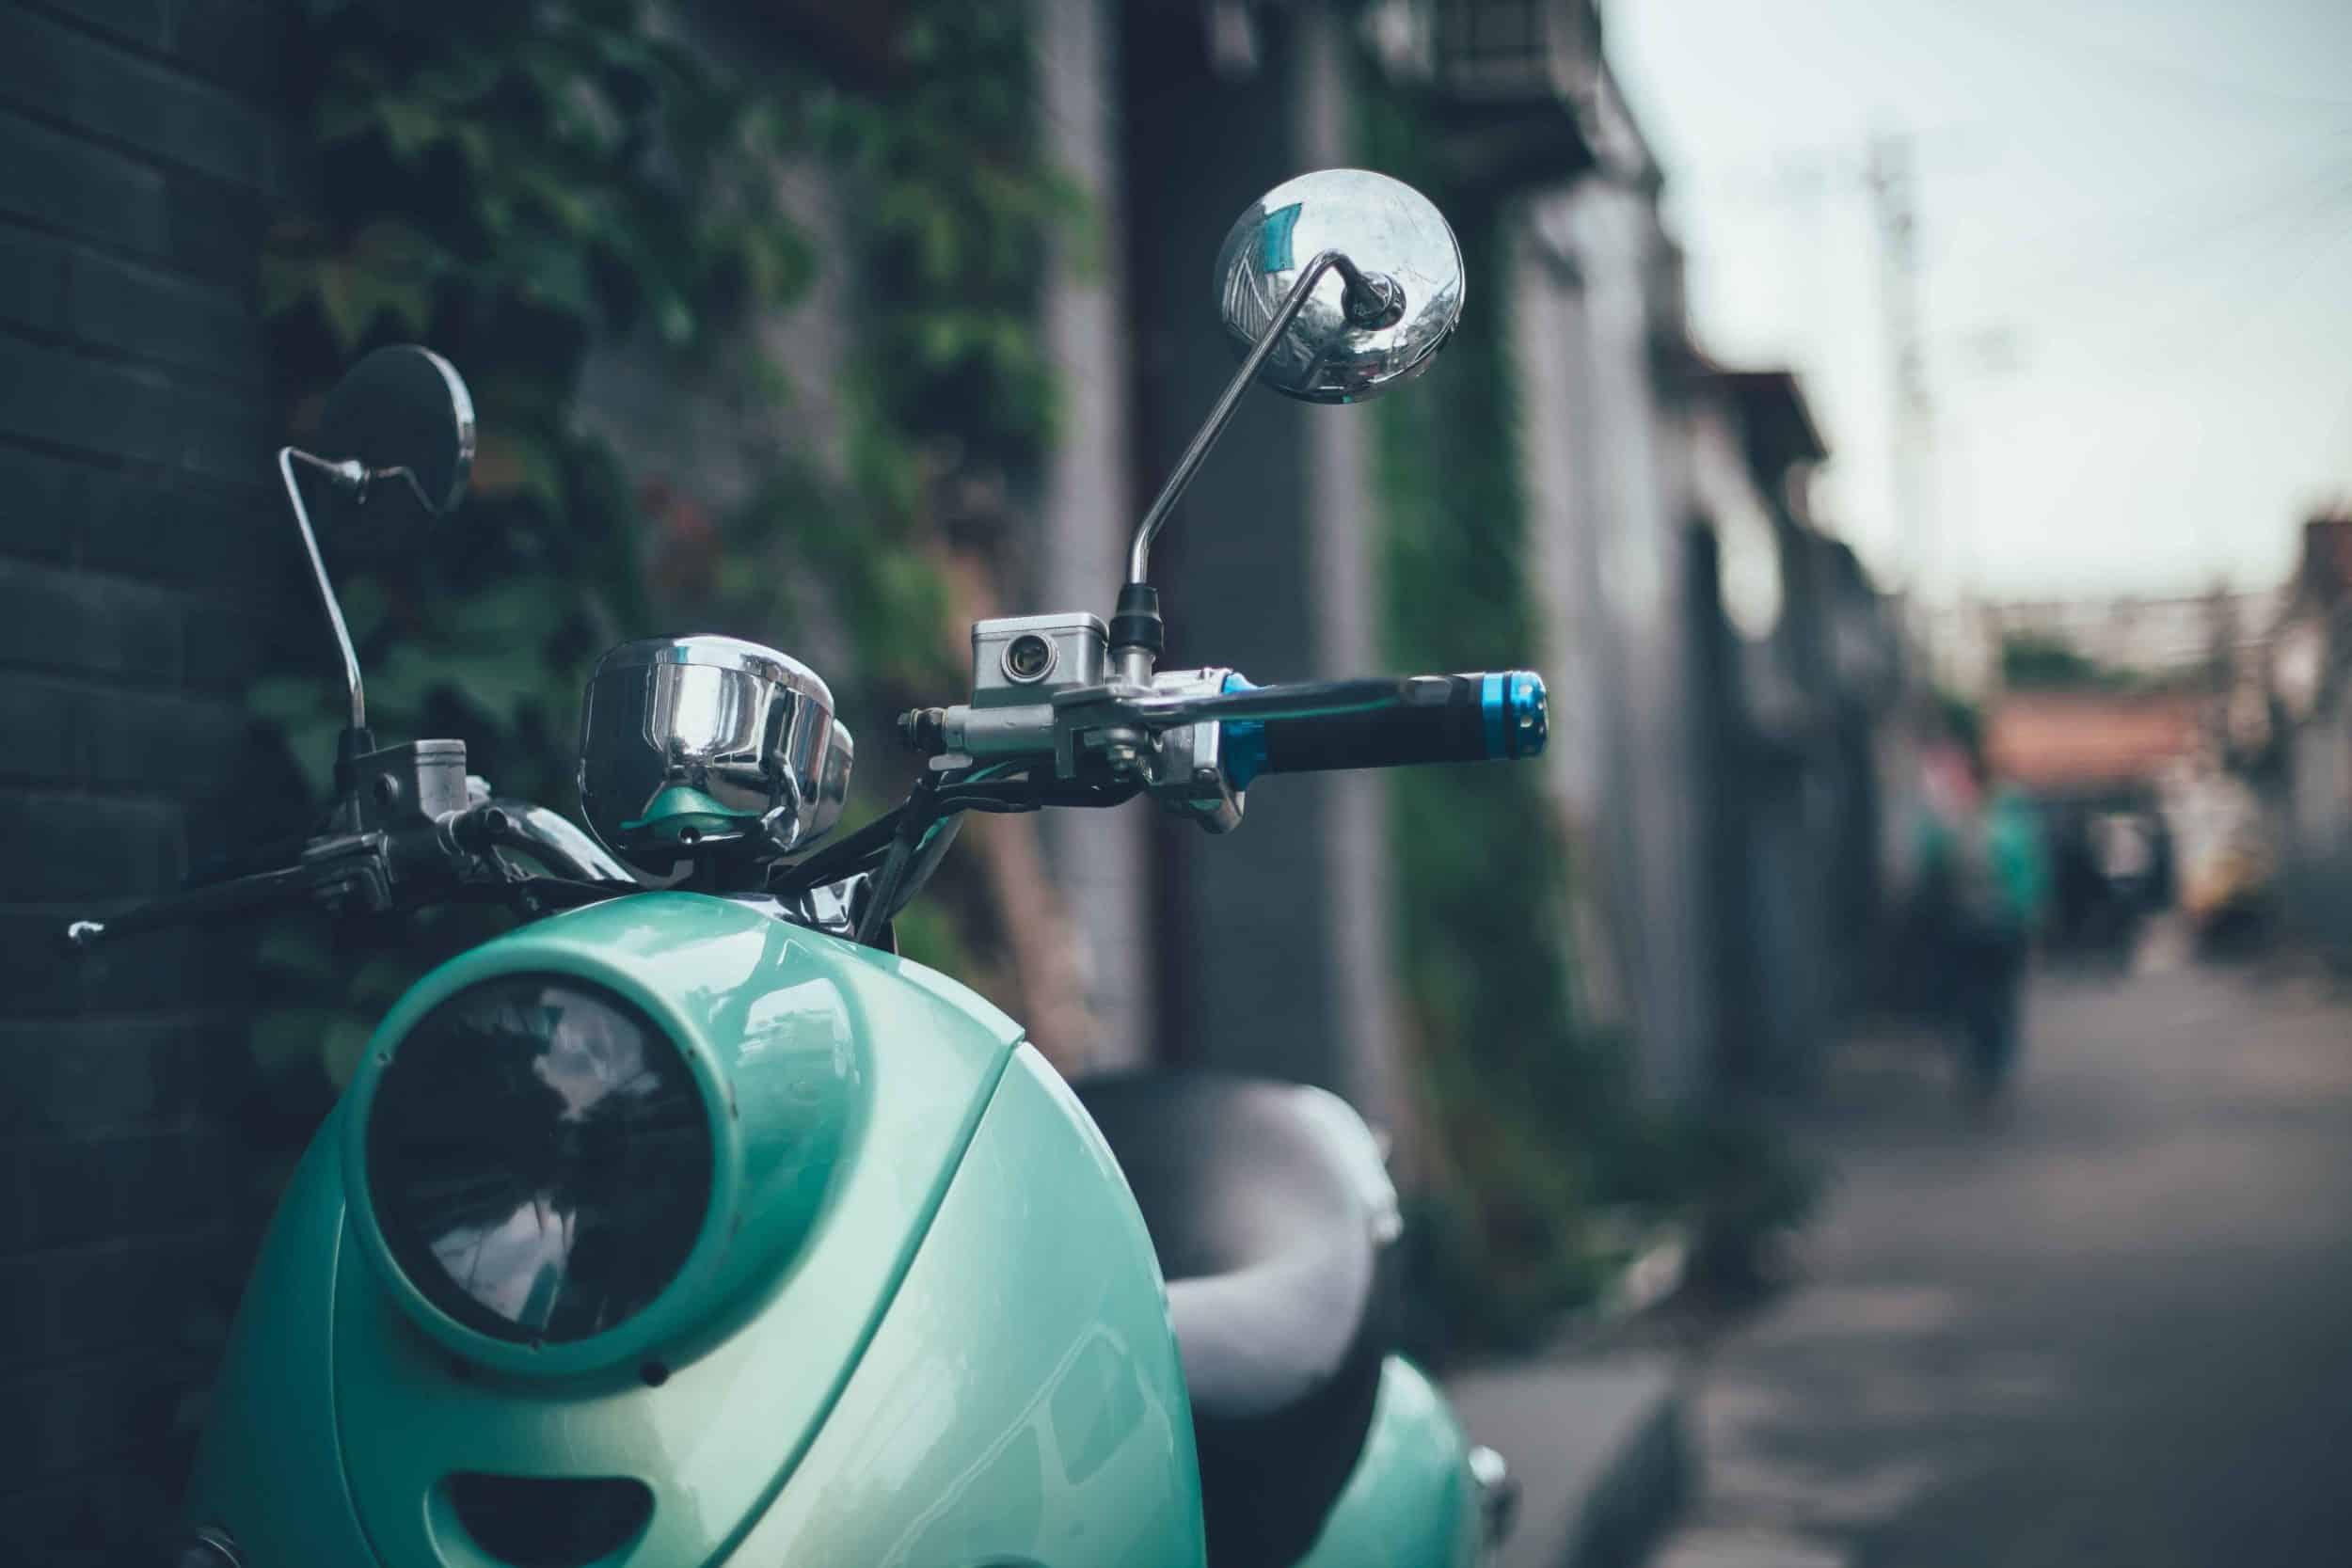 scooter da trasportare